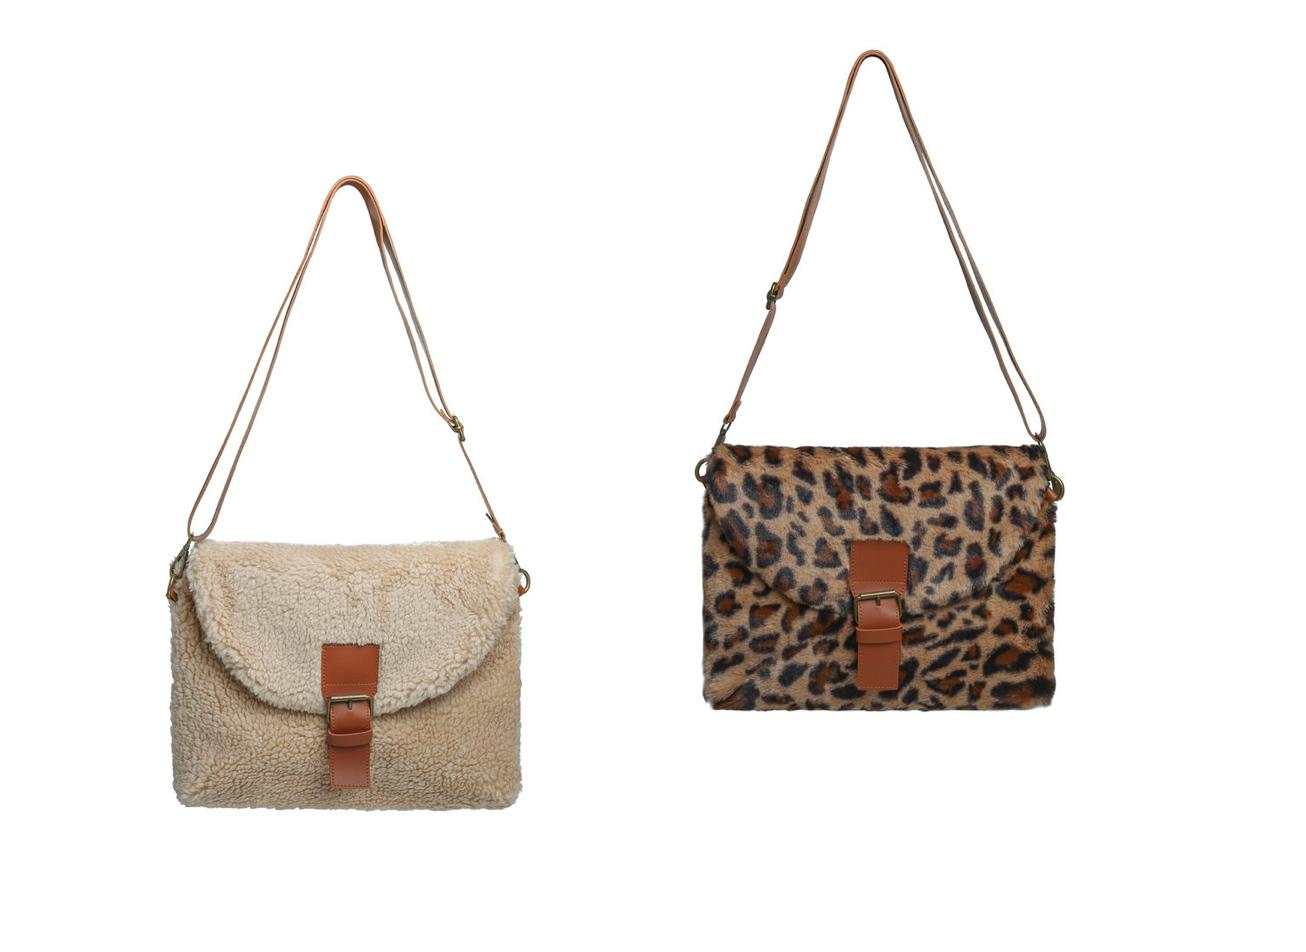 nieuwe musthave fashion trends teddy tassen leopard faux fur